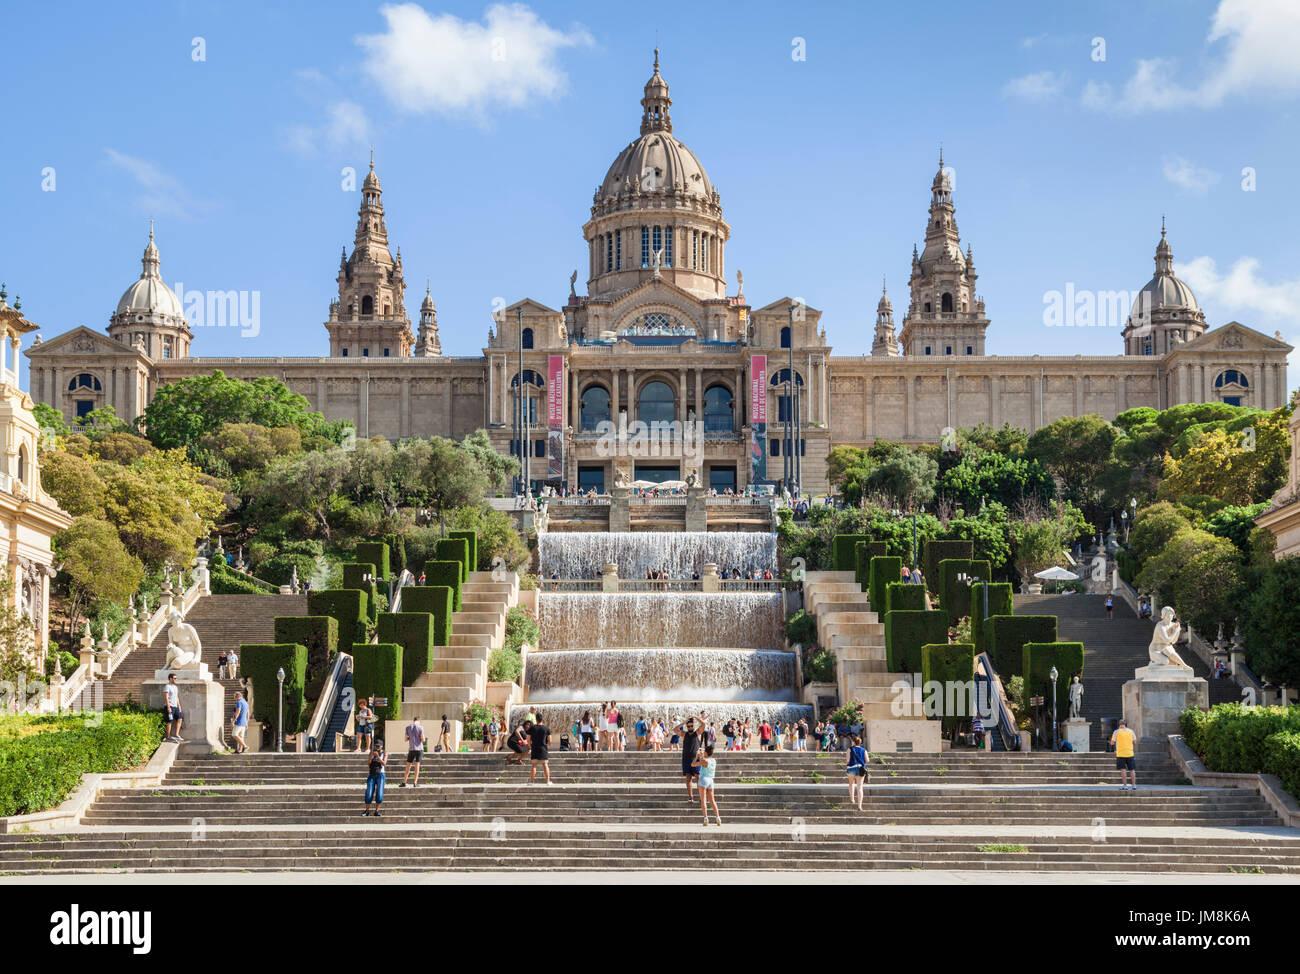 Barcelona Catalunya spain Barcelona city Palau Nacional National Art Museum of Catalonia Placa de les Cascades Water cascade Montjuic Barcelona Spain - Stock Image